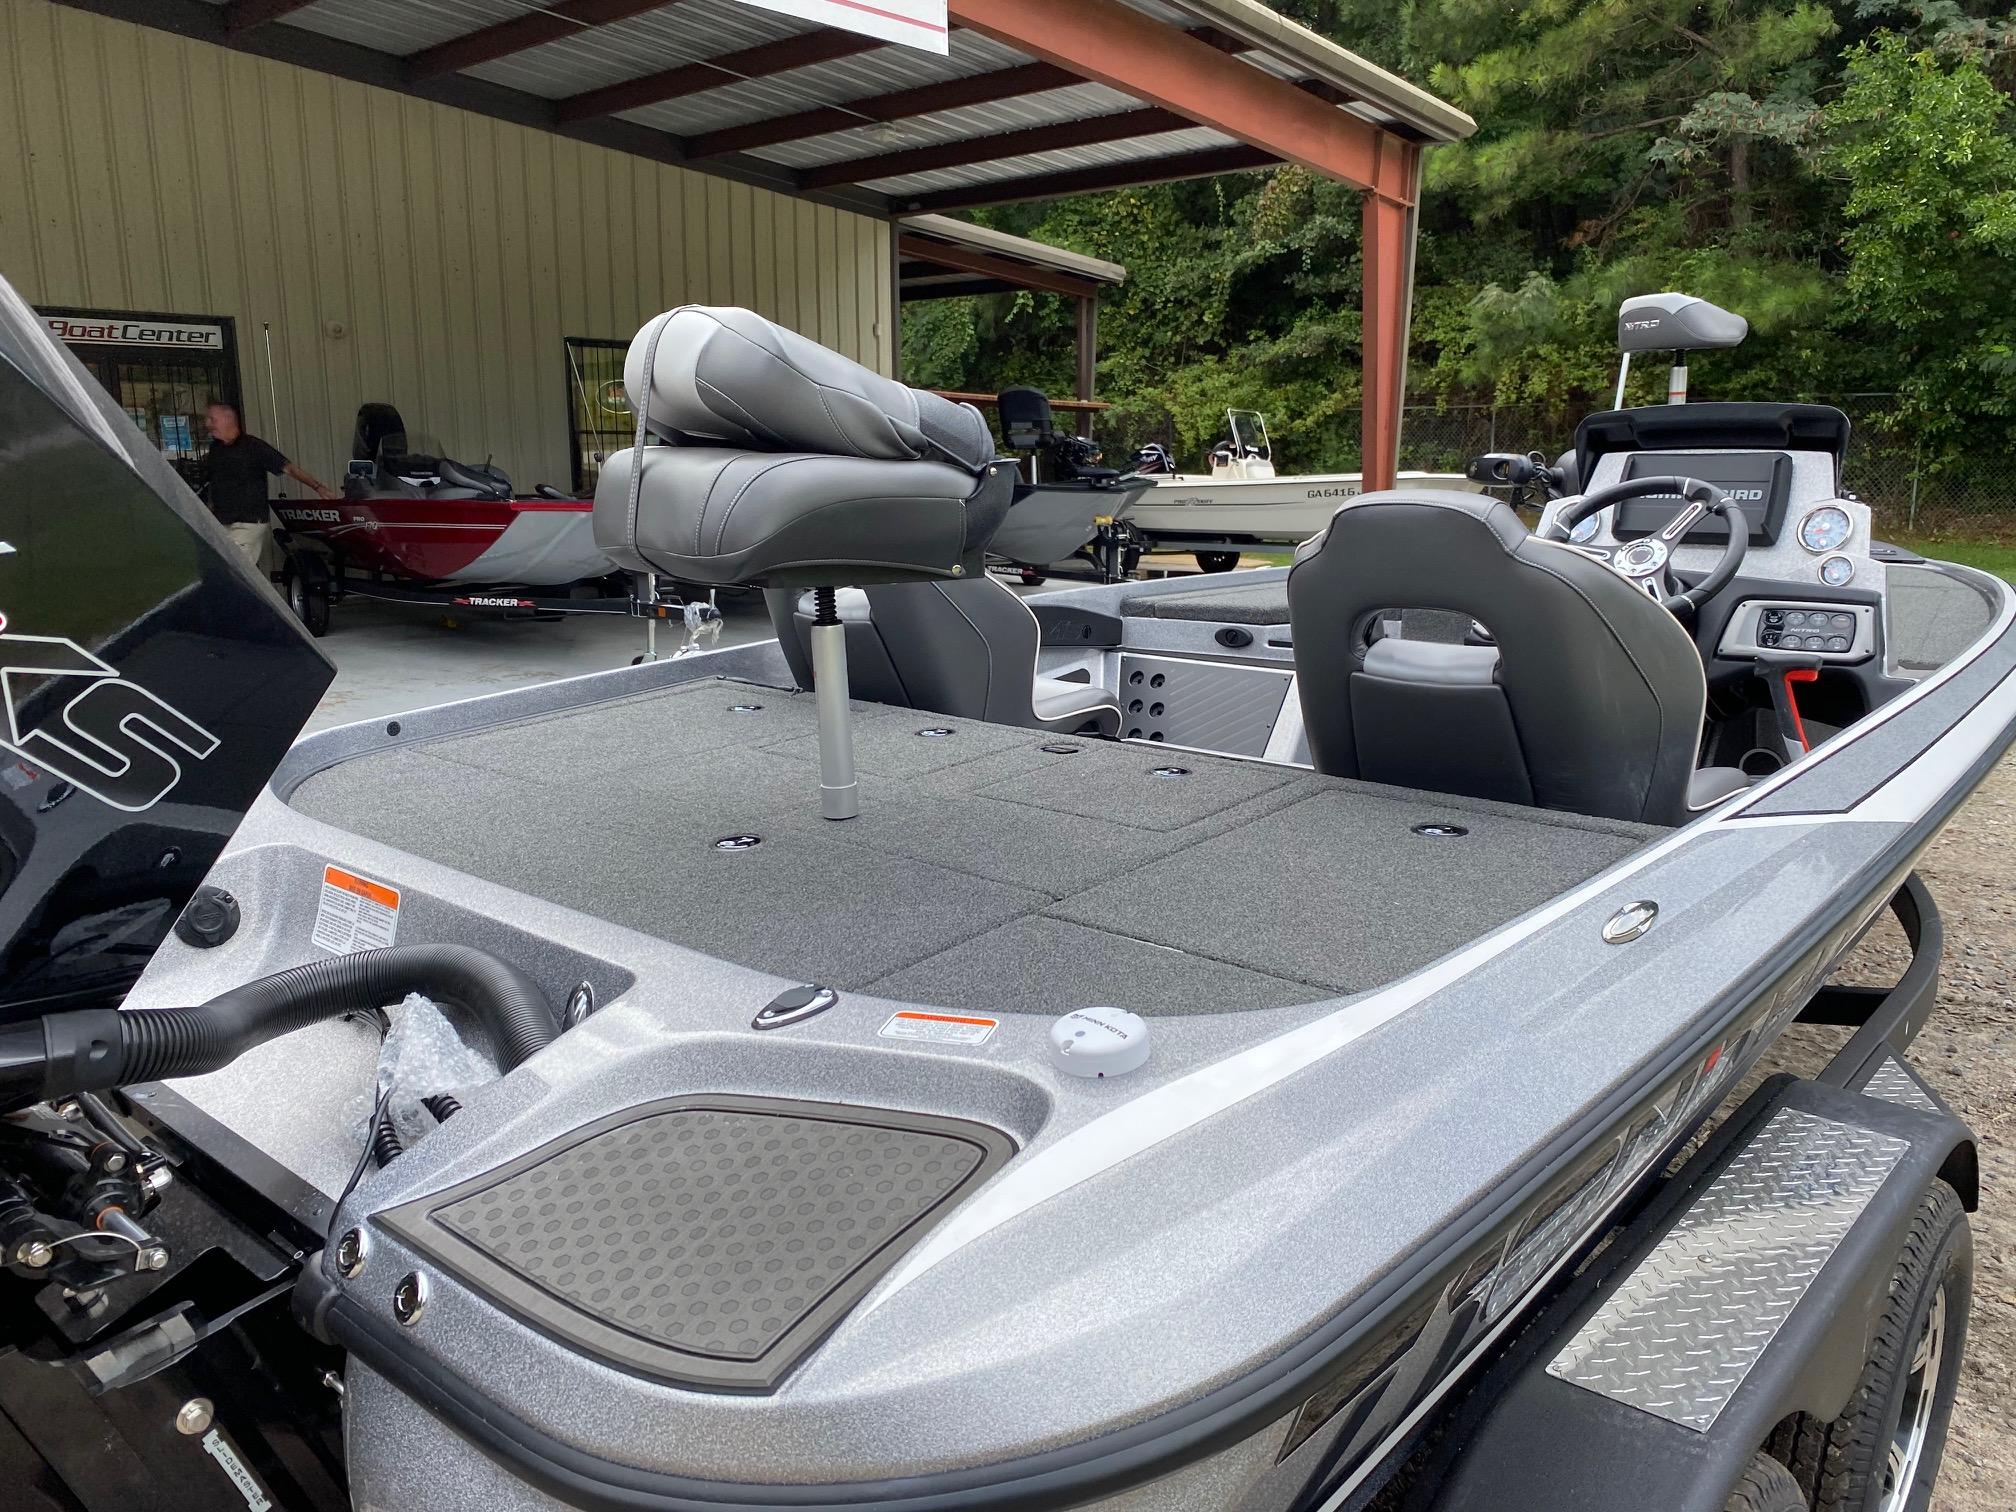 2021 Nitro boat for sale, model of the boat is Z19 w/200L PXS4 & Image # 26 of 50